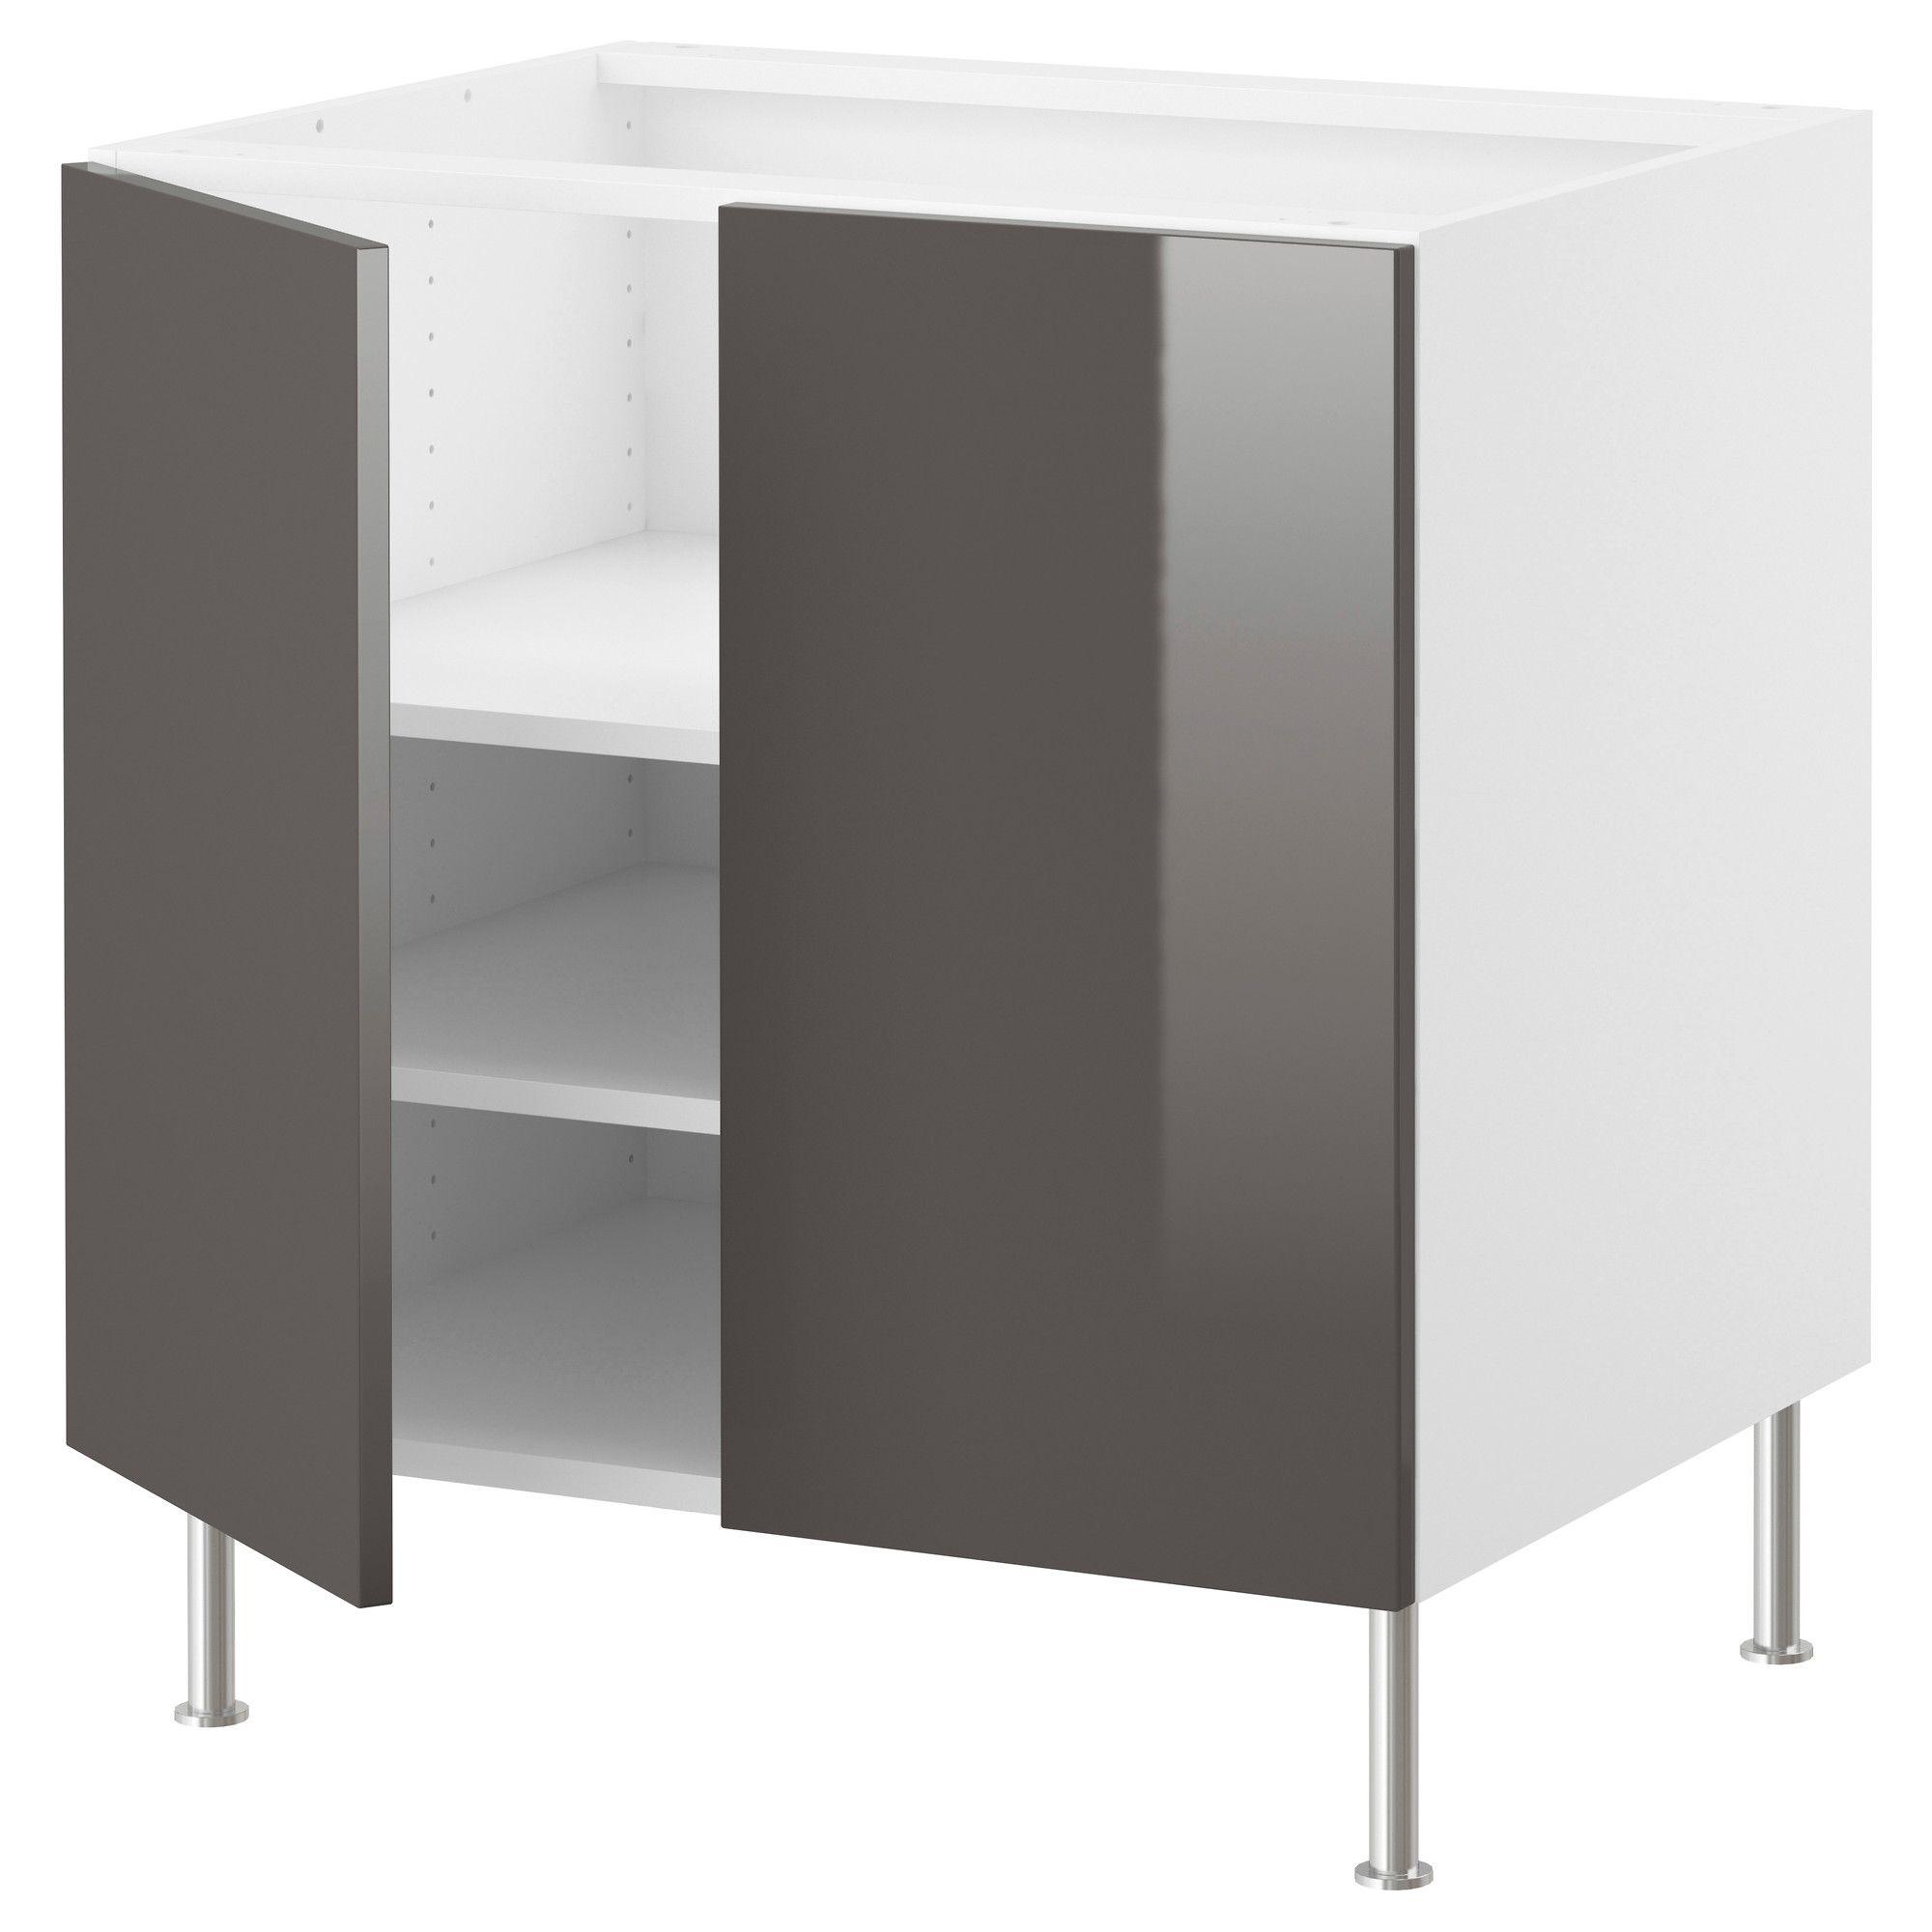 US Furniture and Home Furnishings Ikea, Base